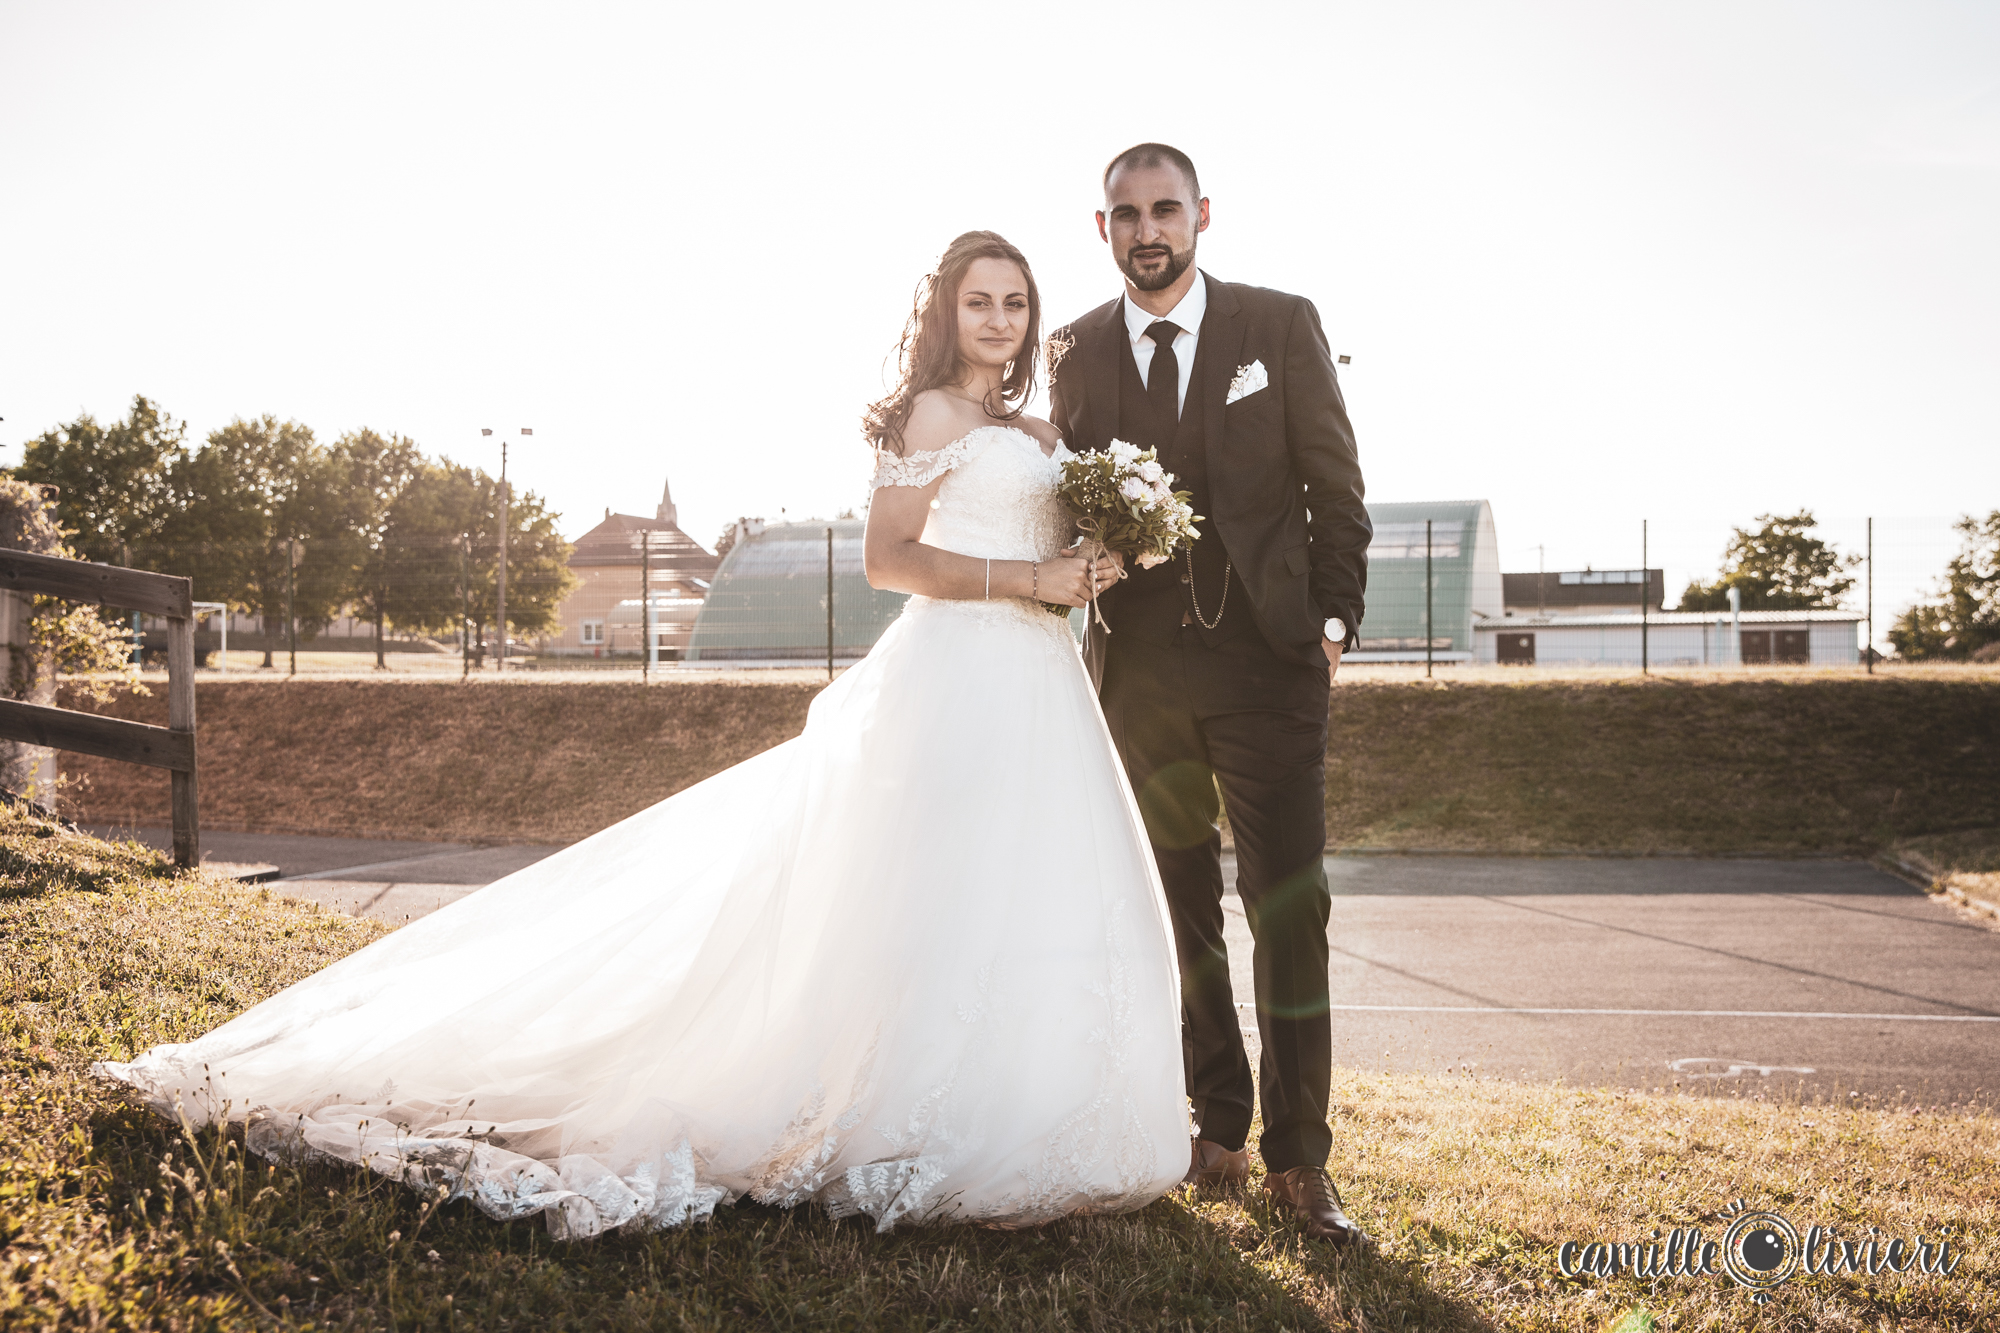 photographe_grenoble_mariage-camille-olivieri-70